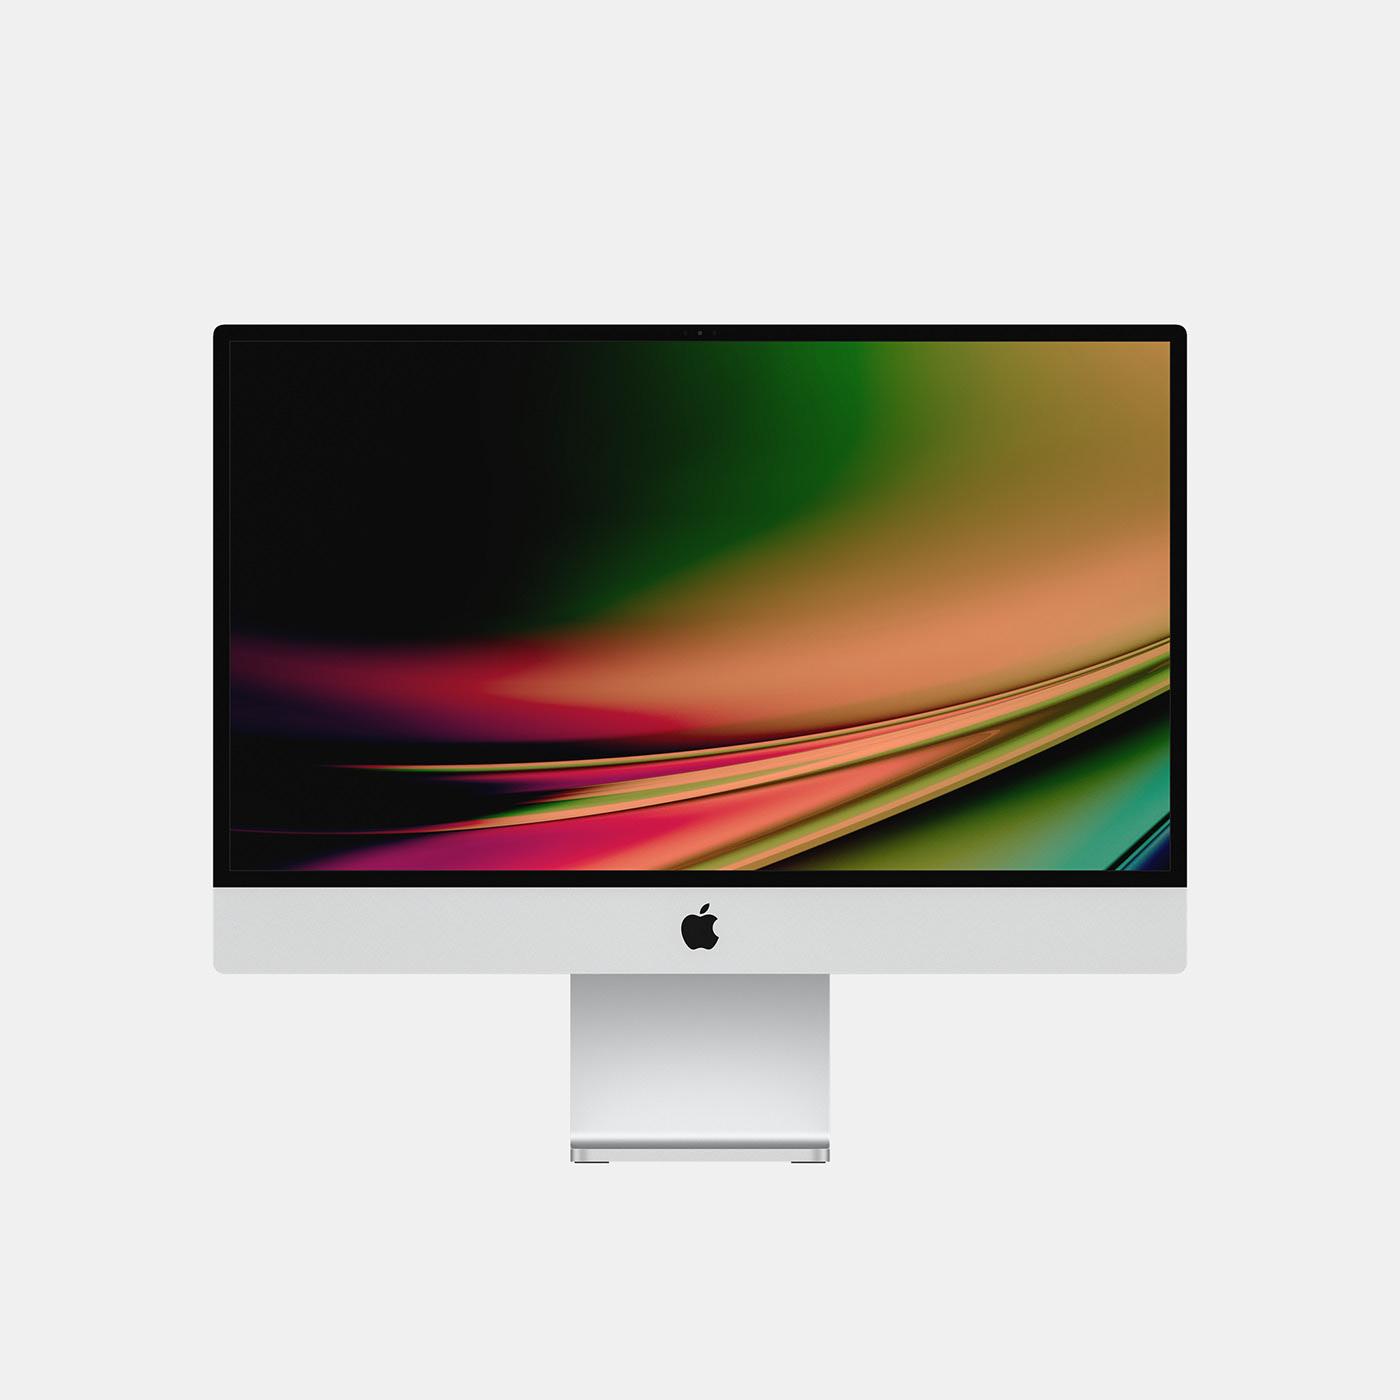 imac-concept-resembling-pro-display-xdr-9